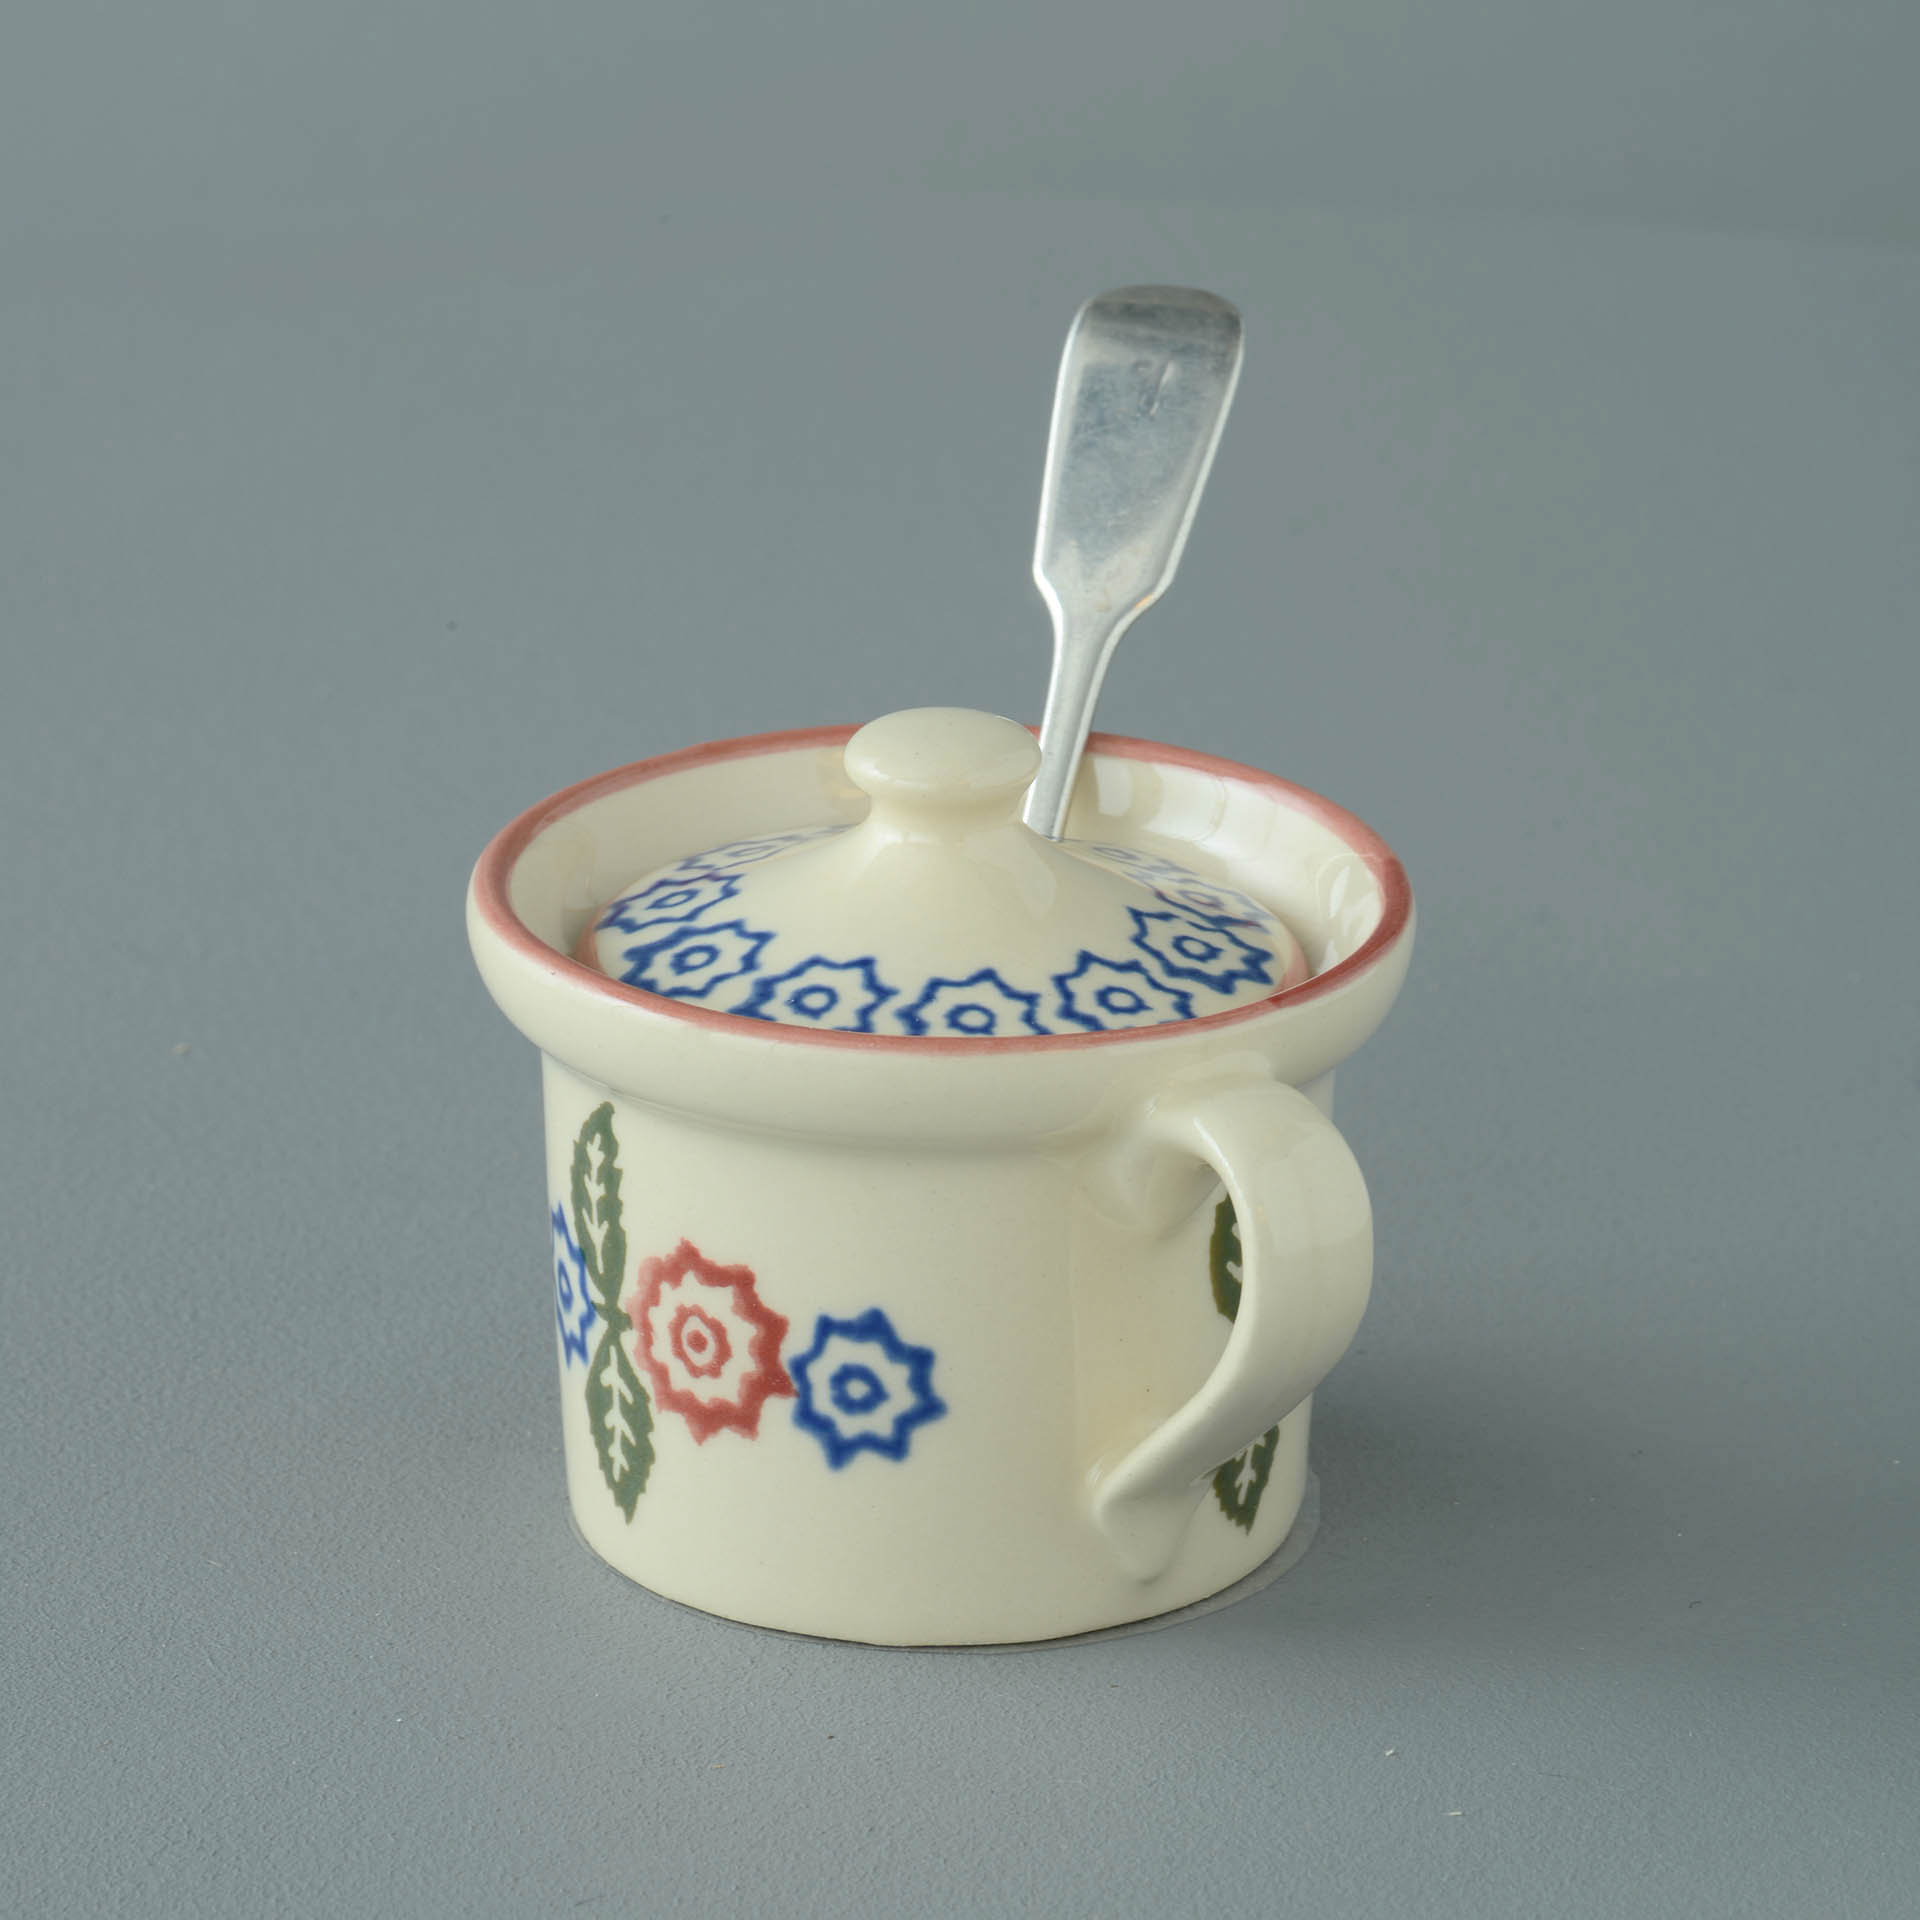 Victorian Floral Mustard Pot 7.8(w) x 5.4(h) cm